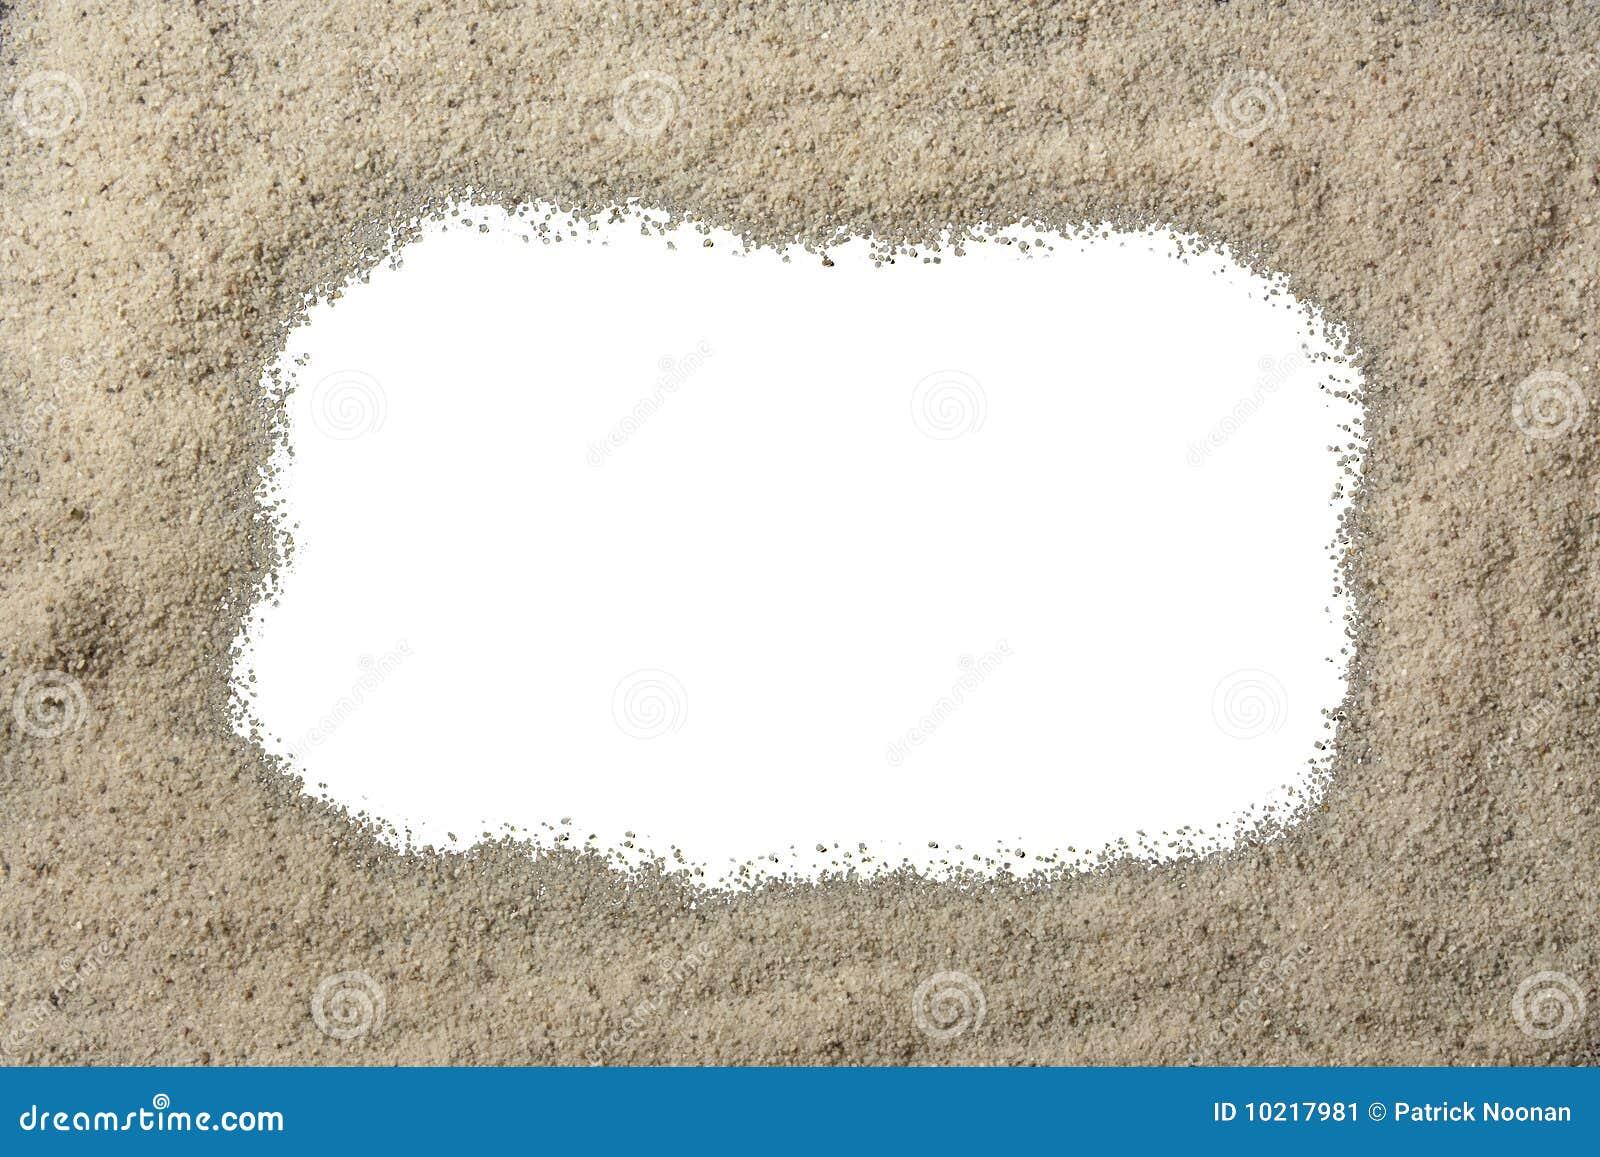 Sand Border